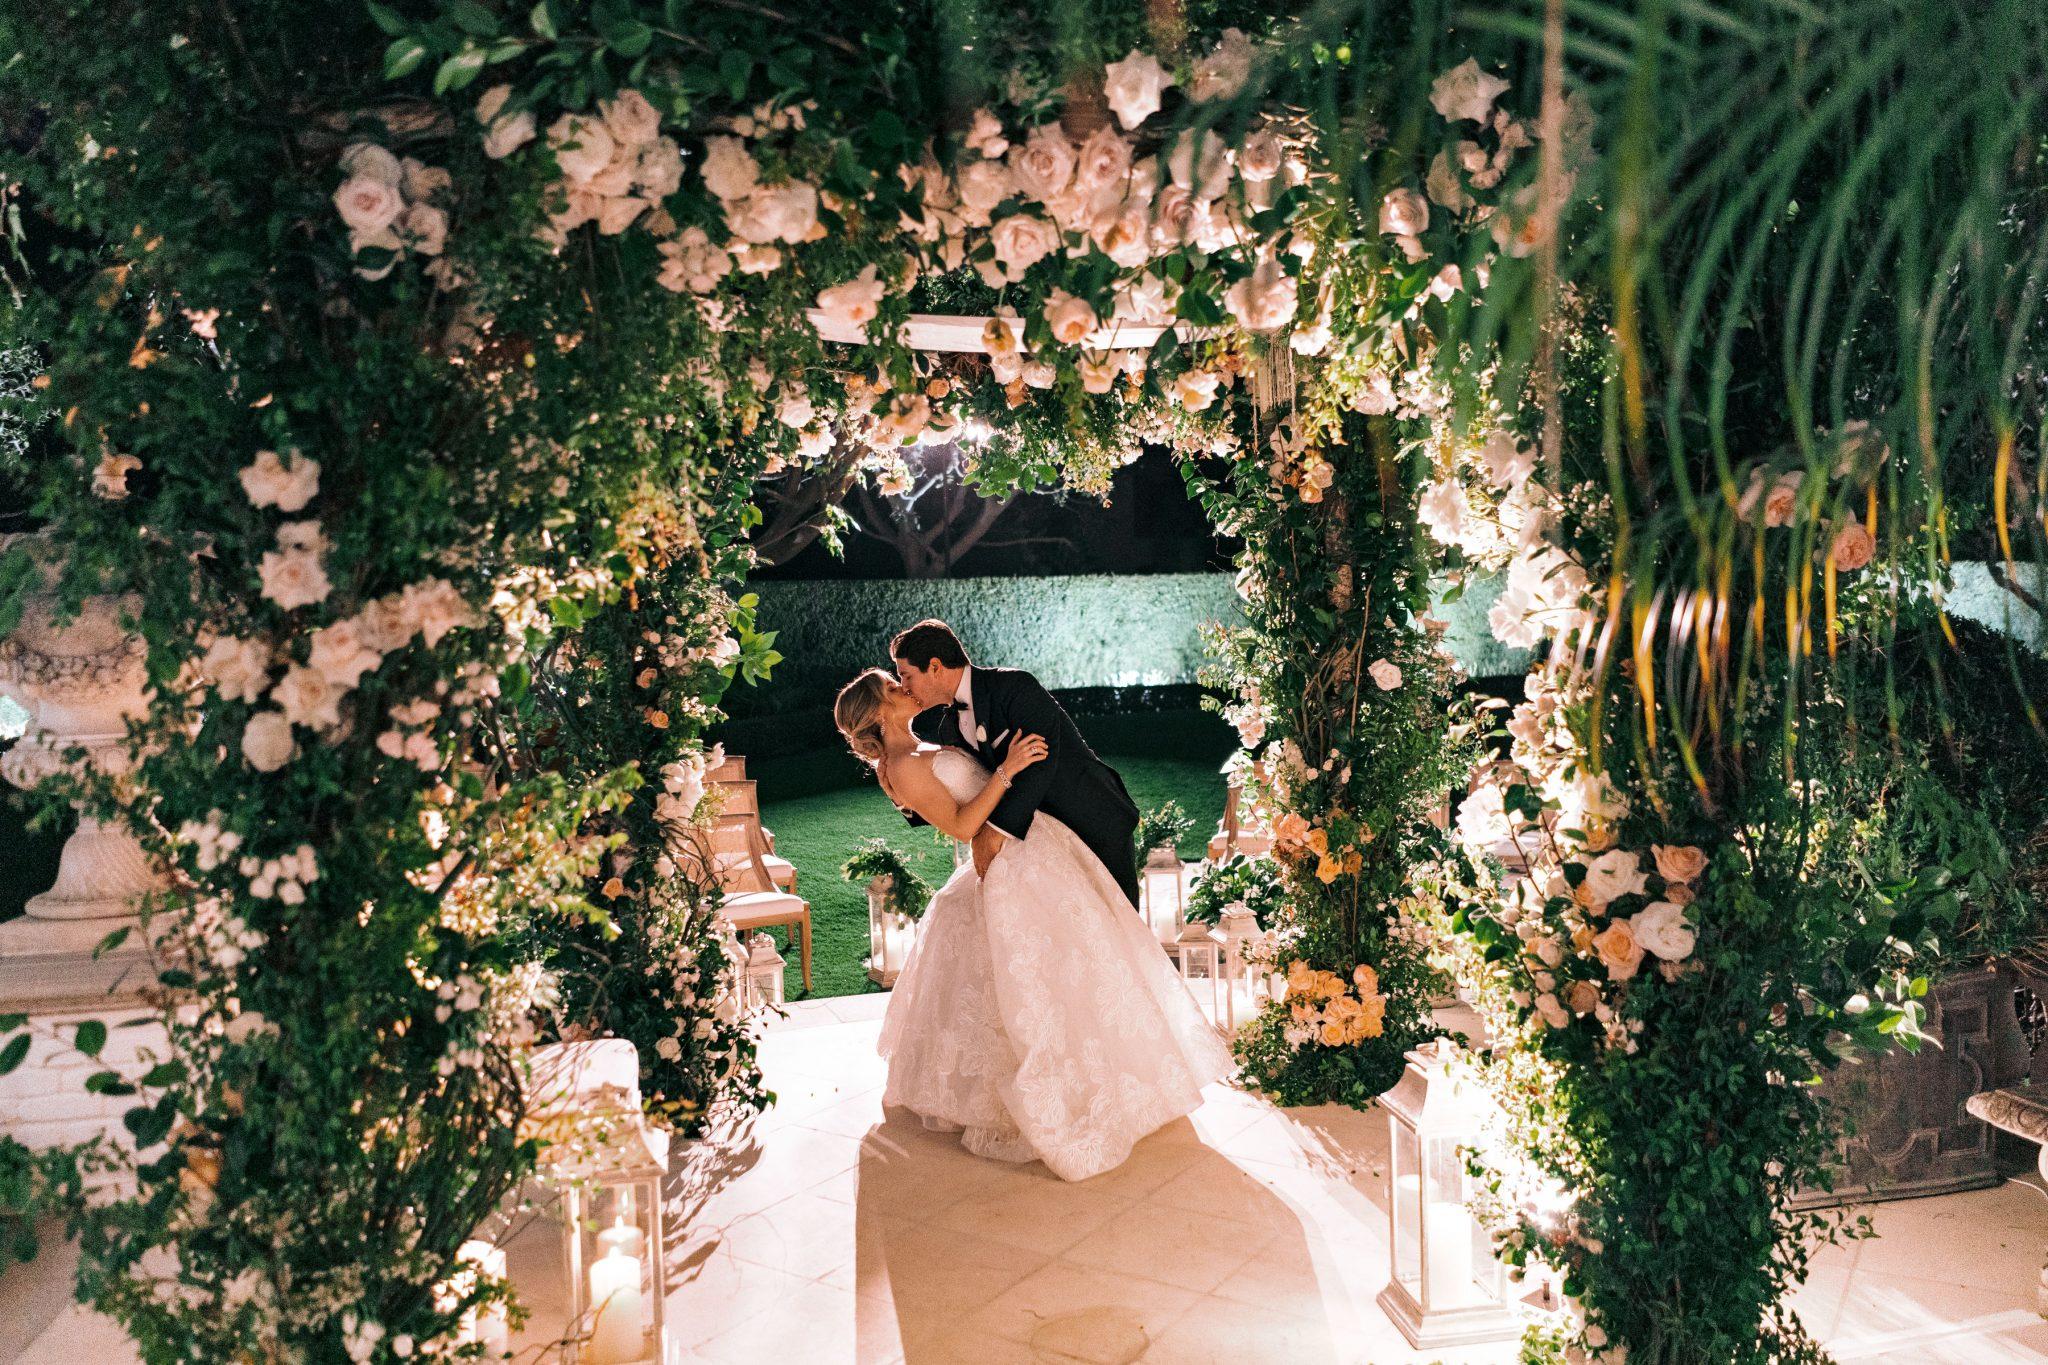 ashley-maxx-beverly-hills-wedding-202